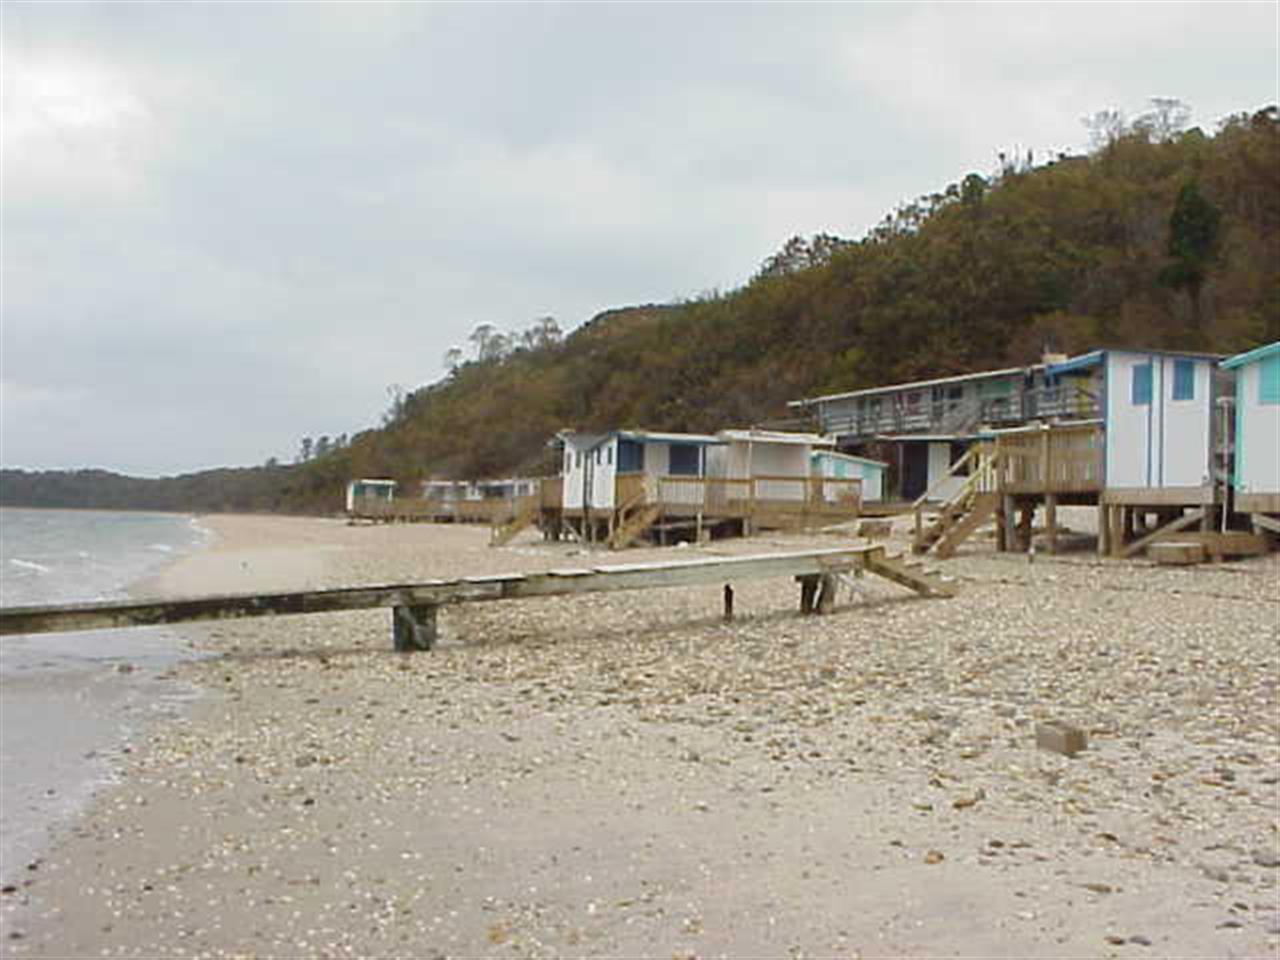 #longisland #northshore #Setauket #oldfieldbeachcabanas